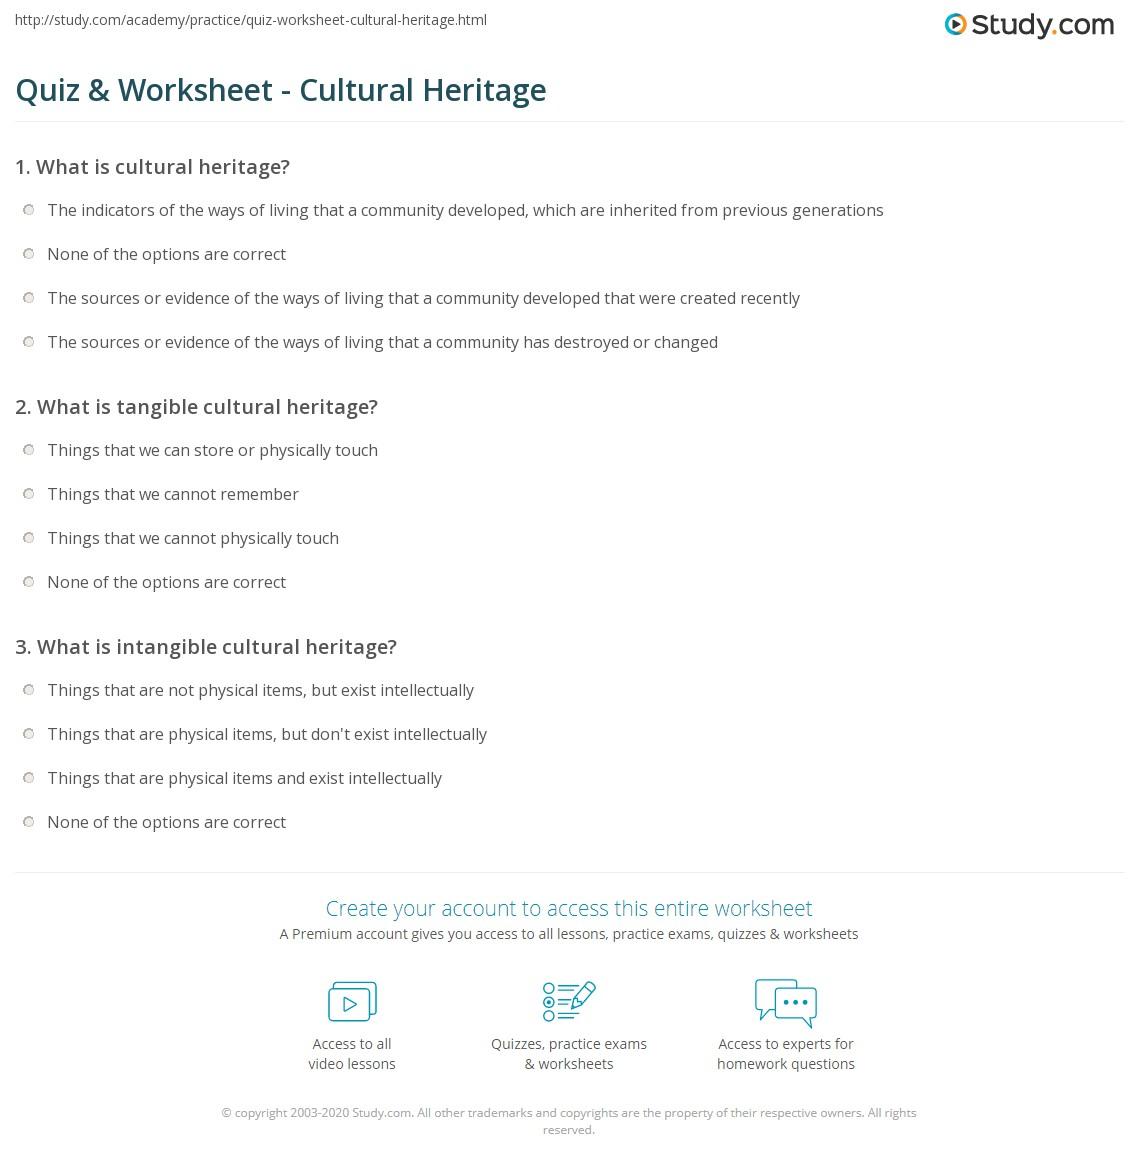 quiz & worksheet - cultural heritage | study